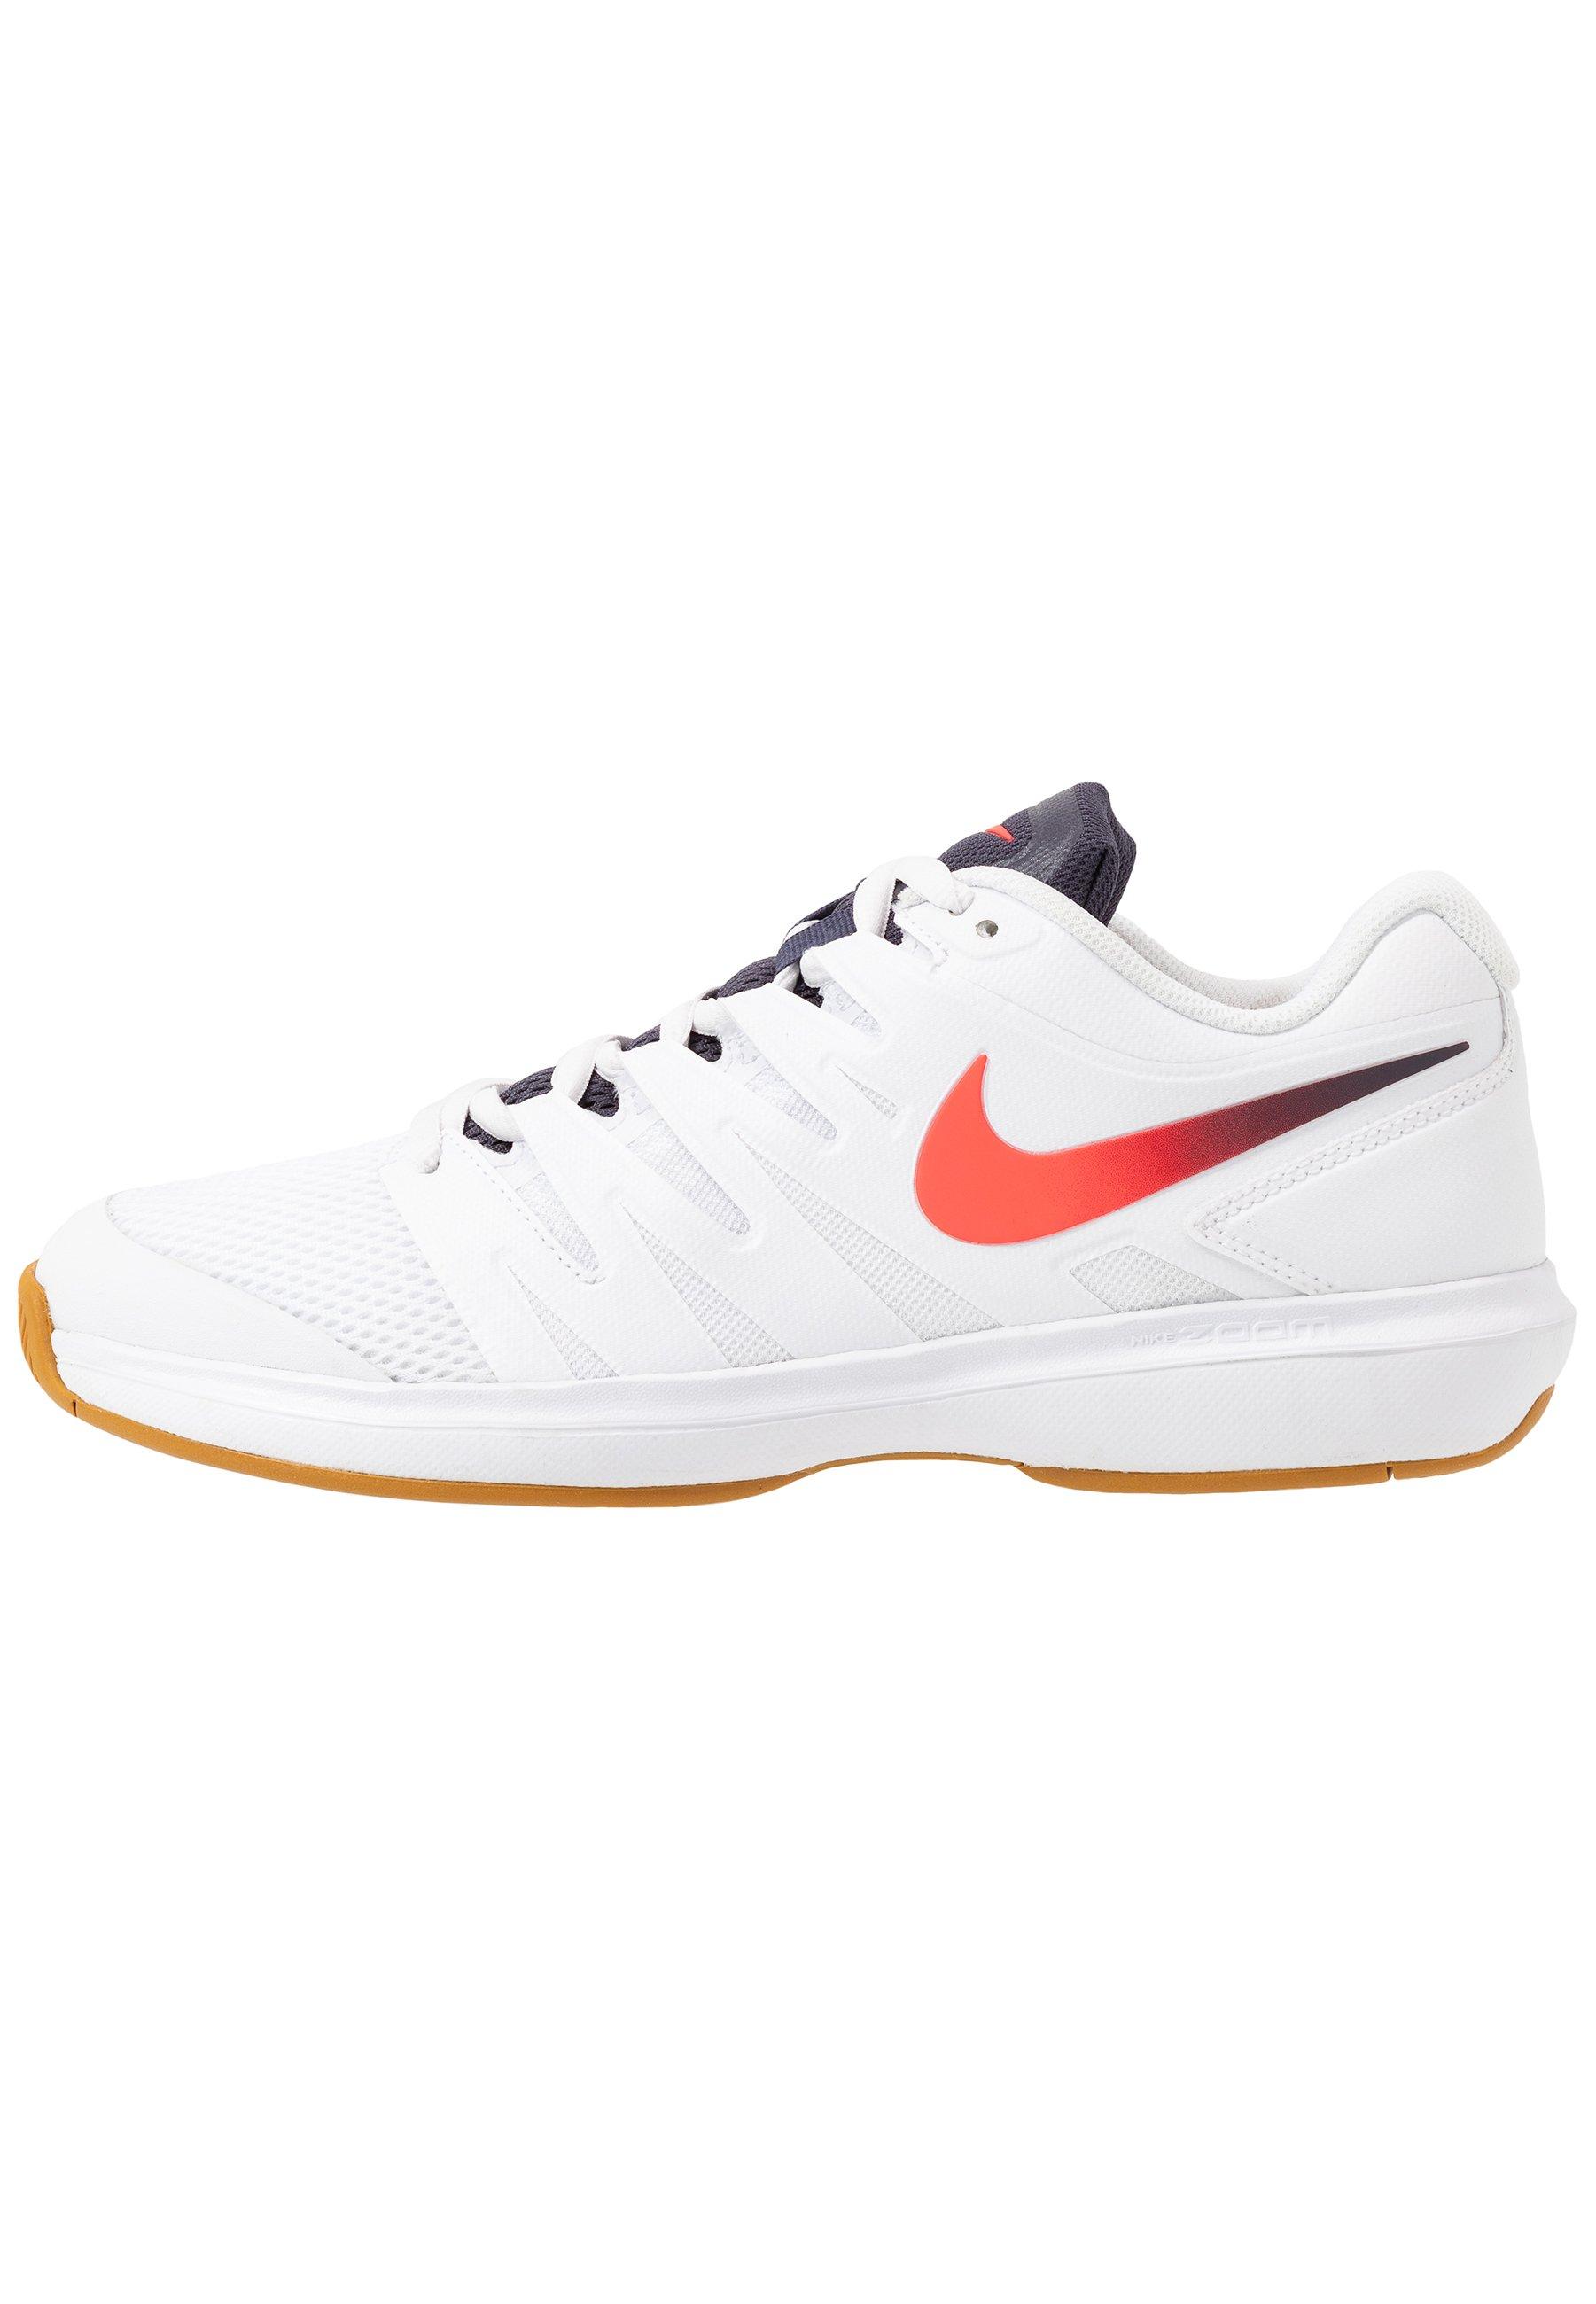 AIR ZOOM PRESTIGE Scarpe da tennis per tutte le superfici whitelaser crimsongridironwheat